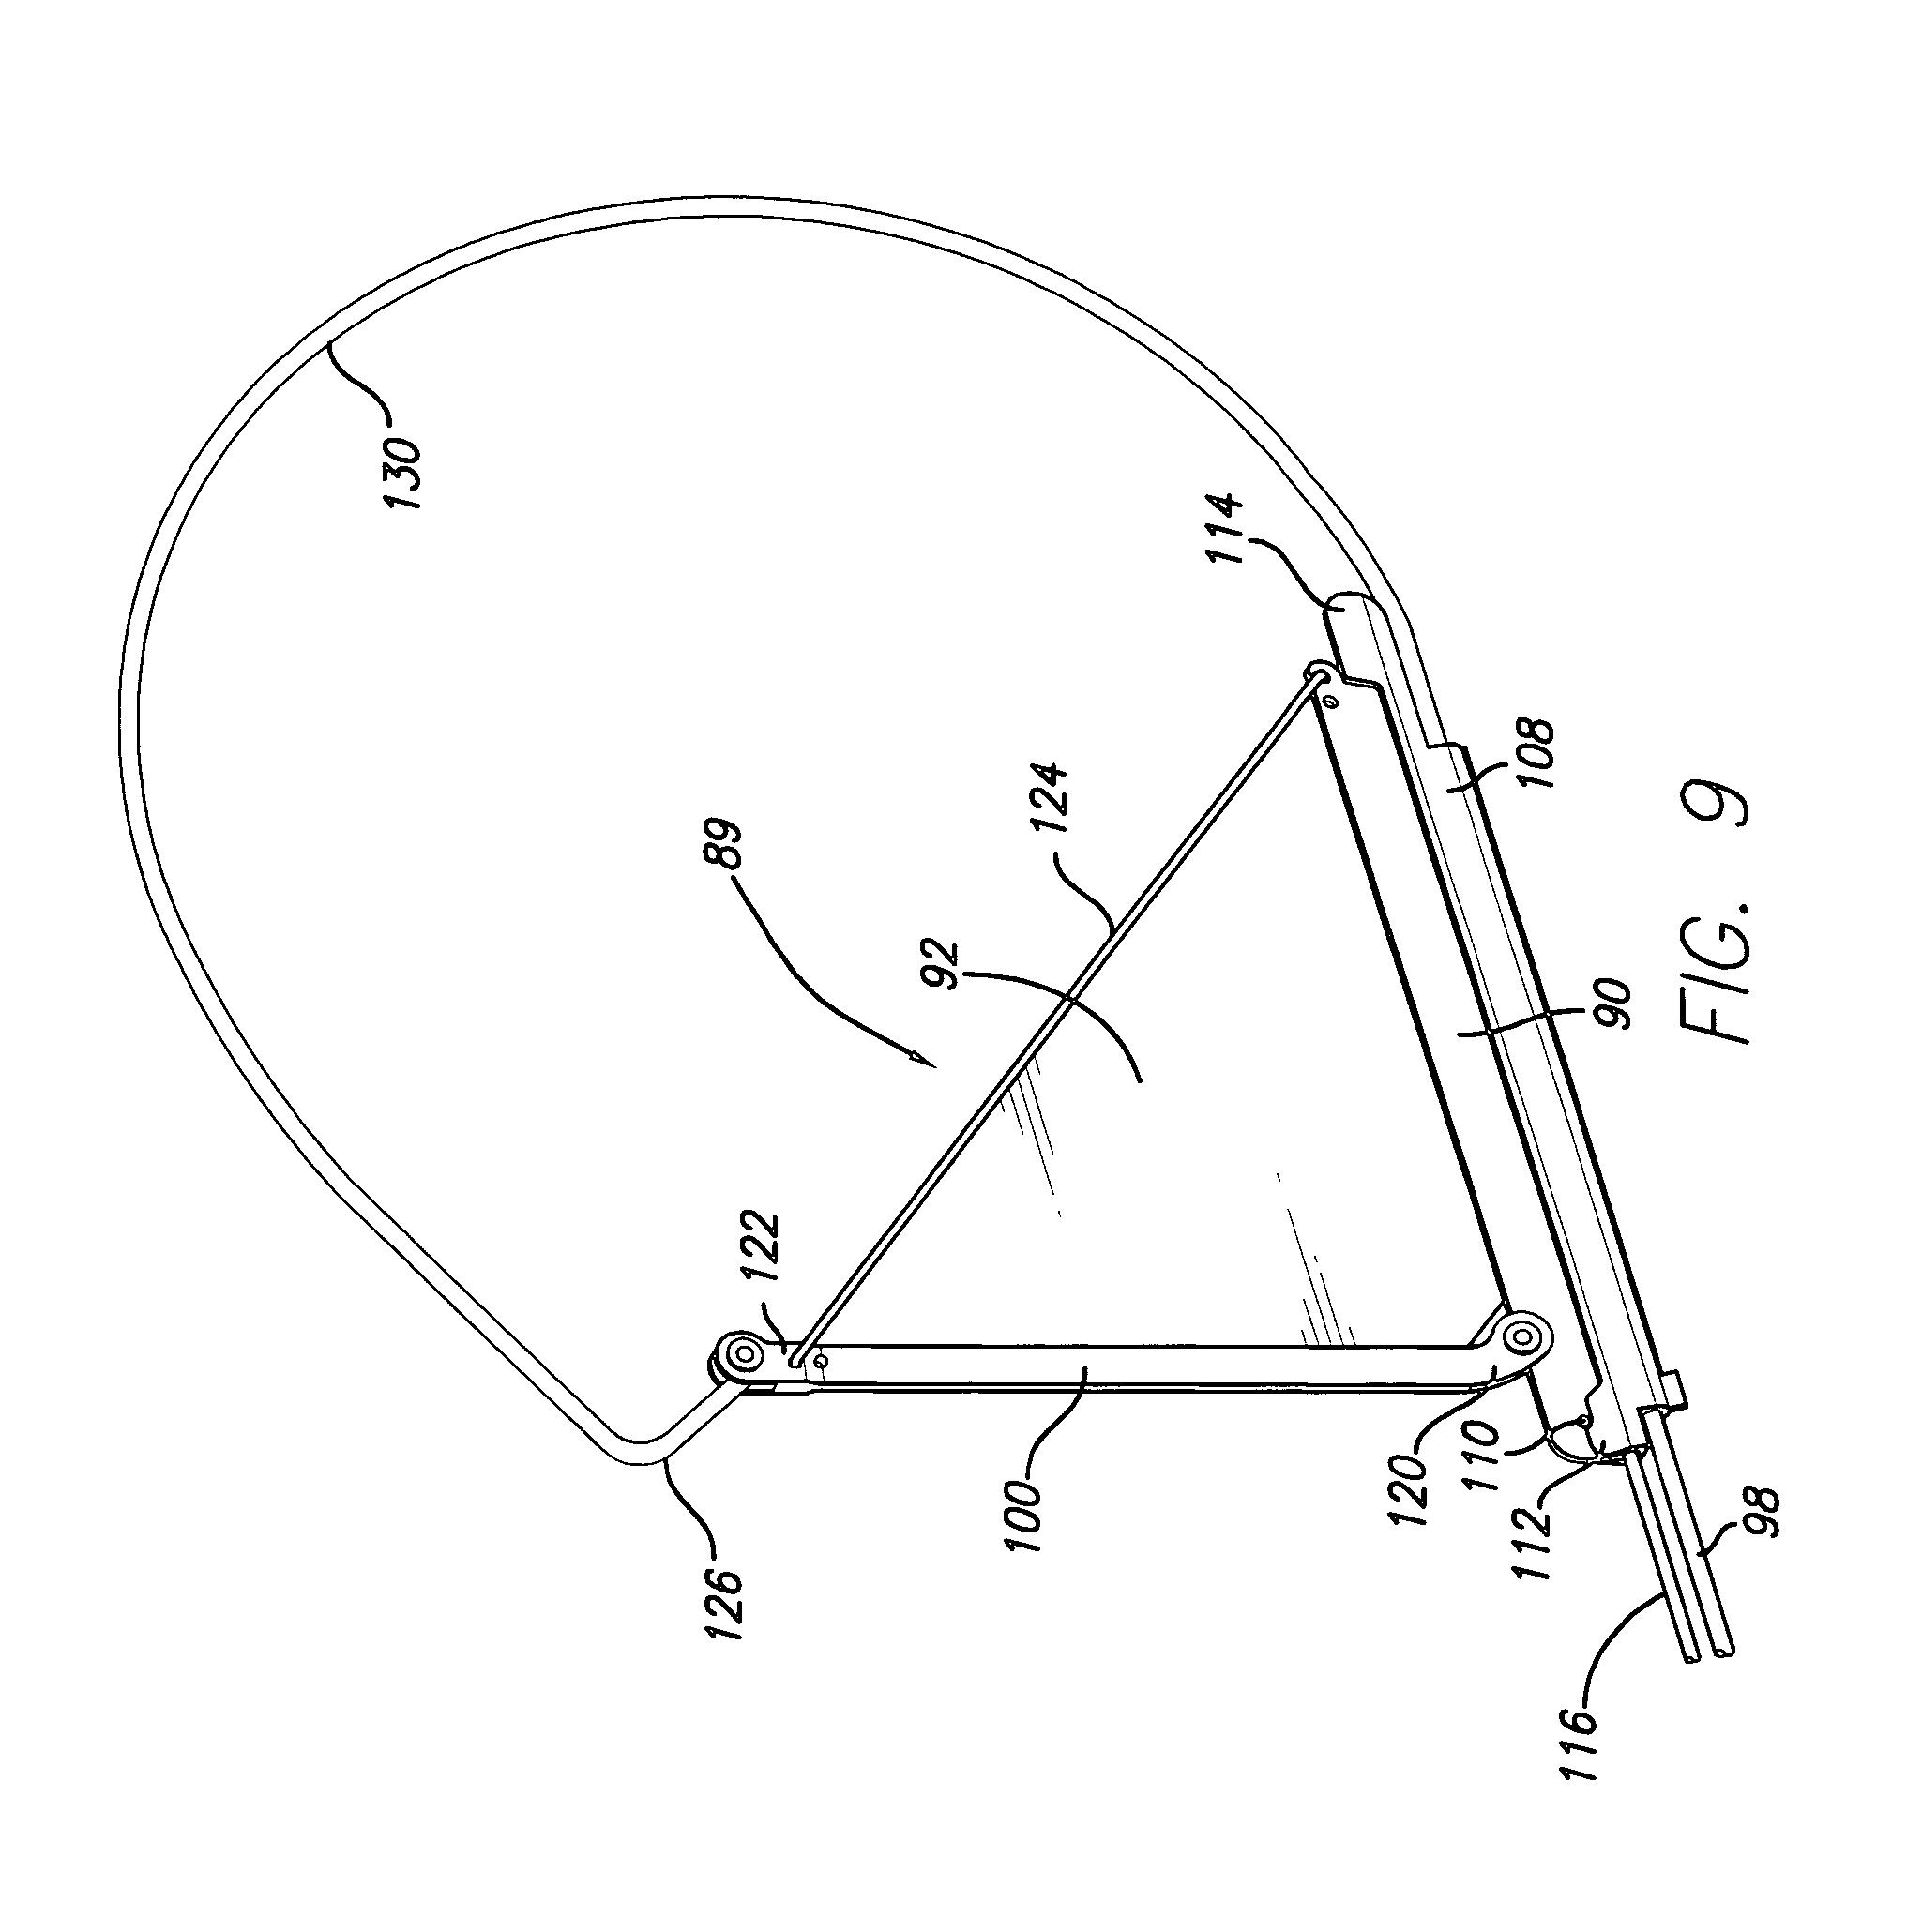 300zx Radio Wiring – Lincoln Aviator Radio Wire Diagram